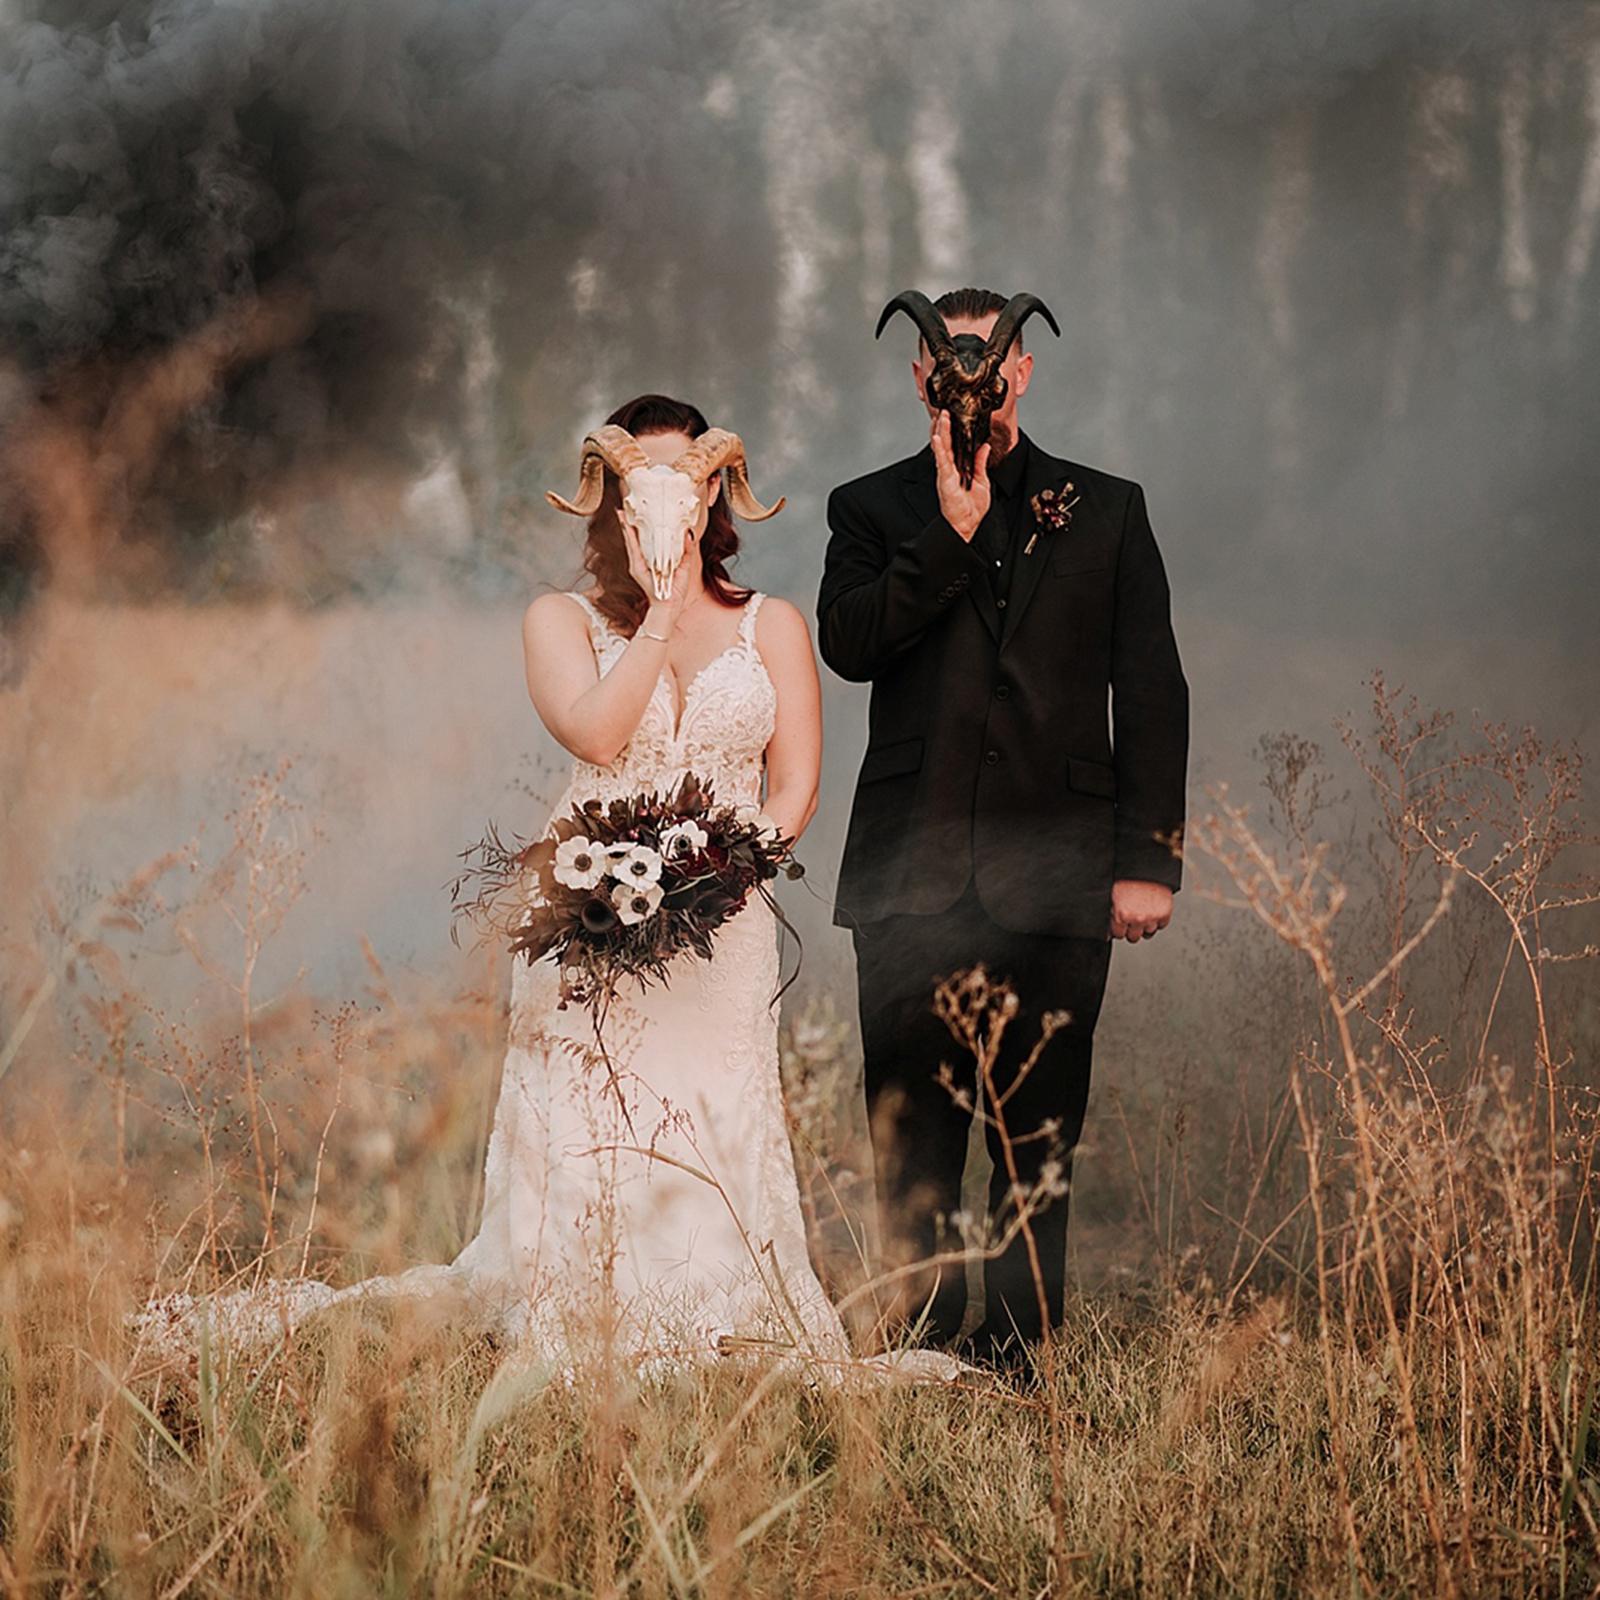 Carrie Ayn Photography Theresa & Kristopher Fall, Dark, Moody Wedding